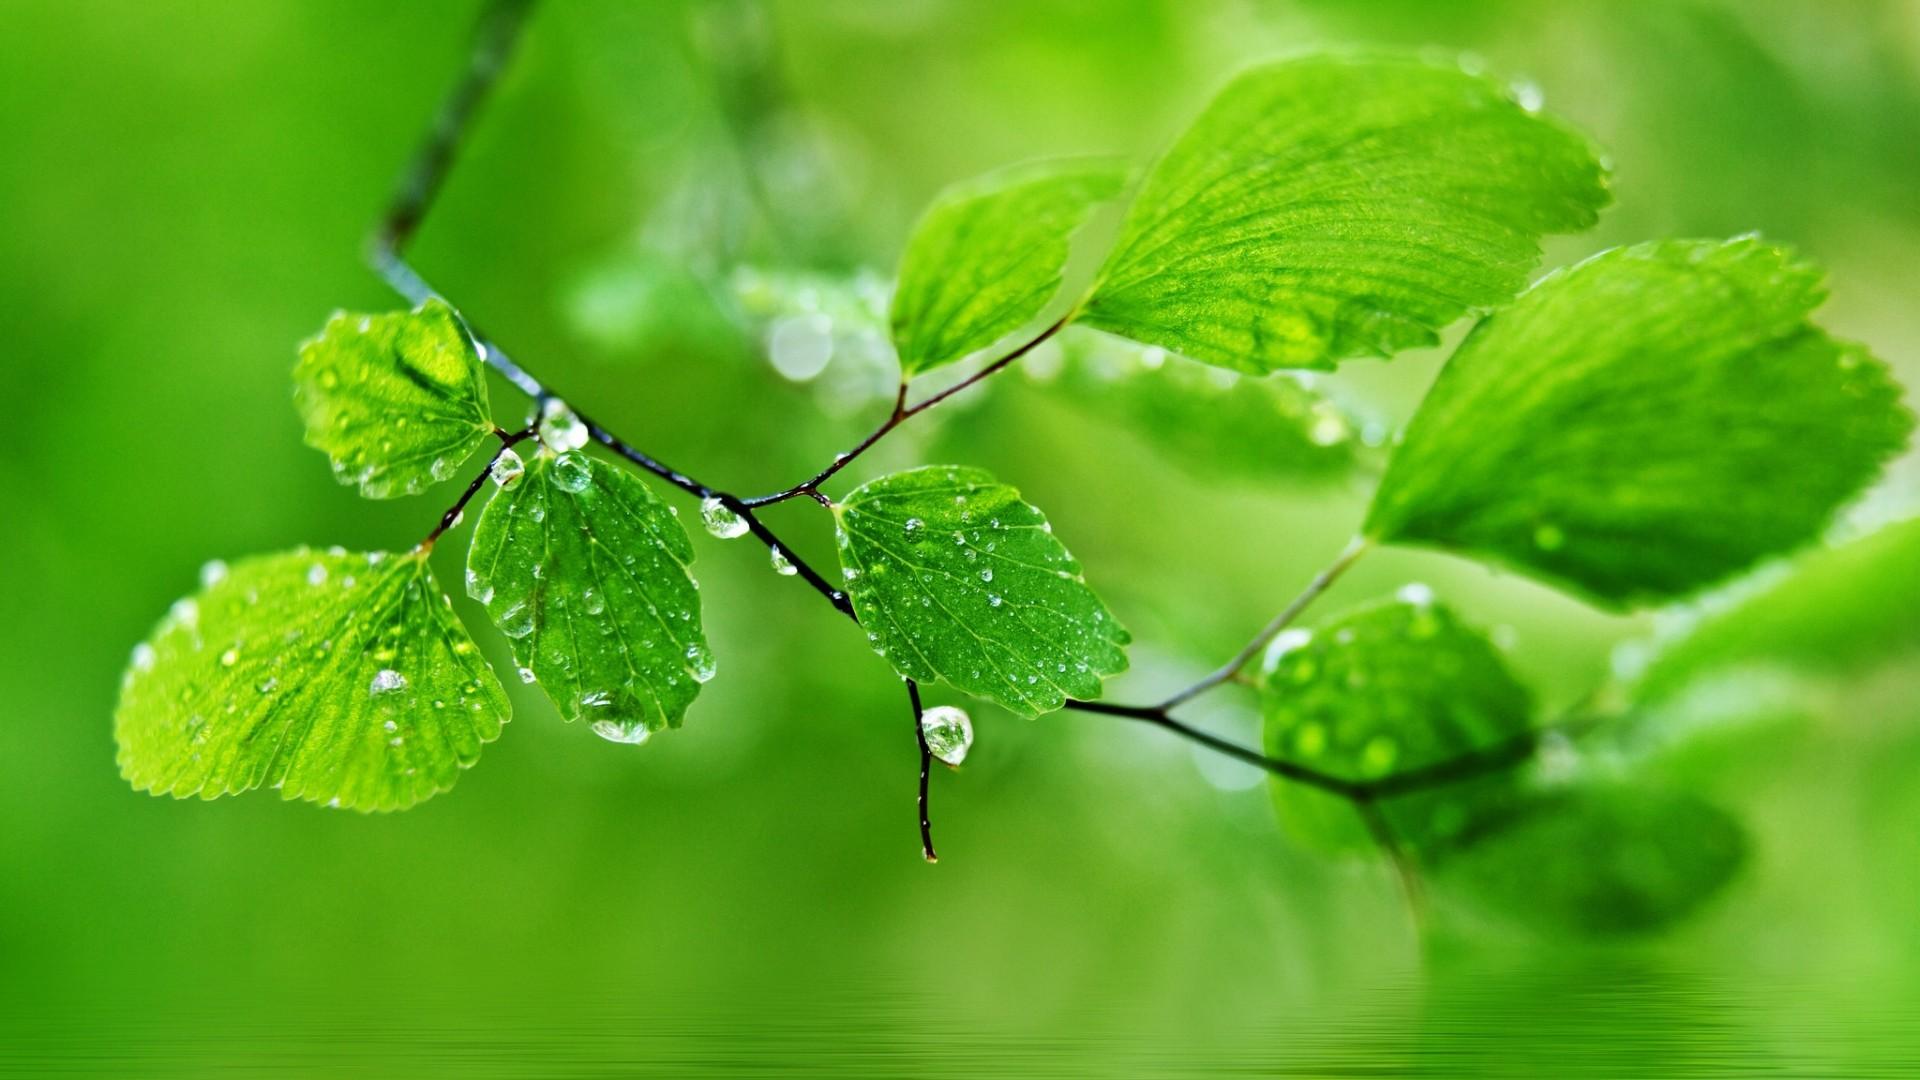 Green Natureal Desktop Wallpapers. Green Natural …